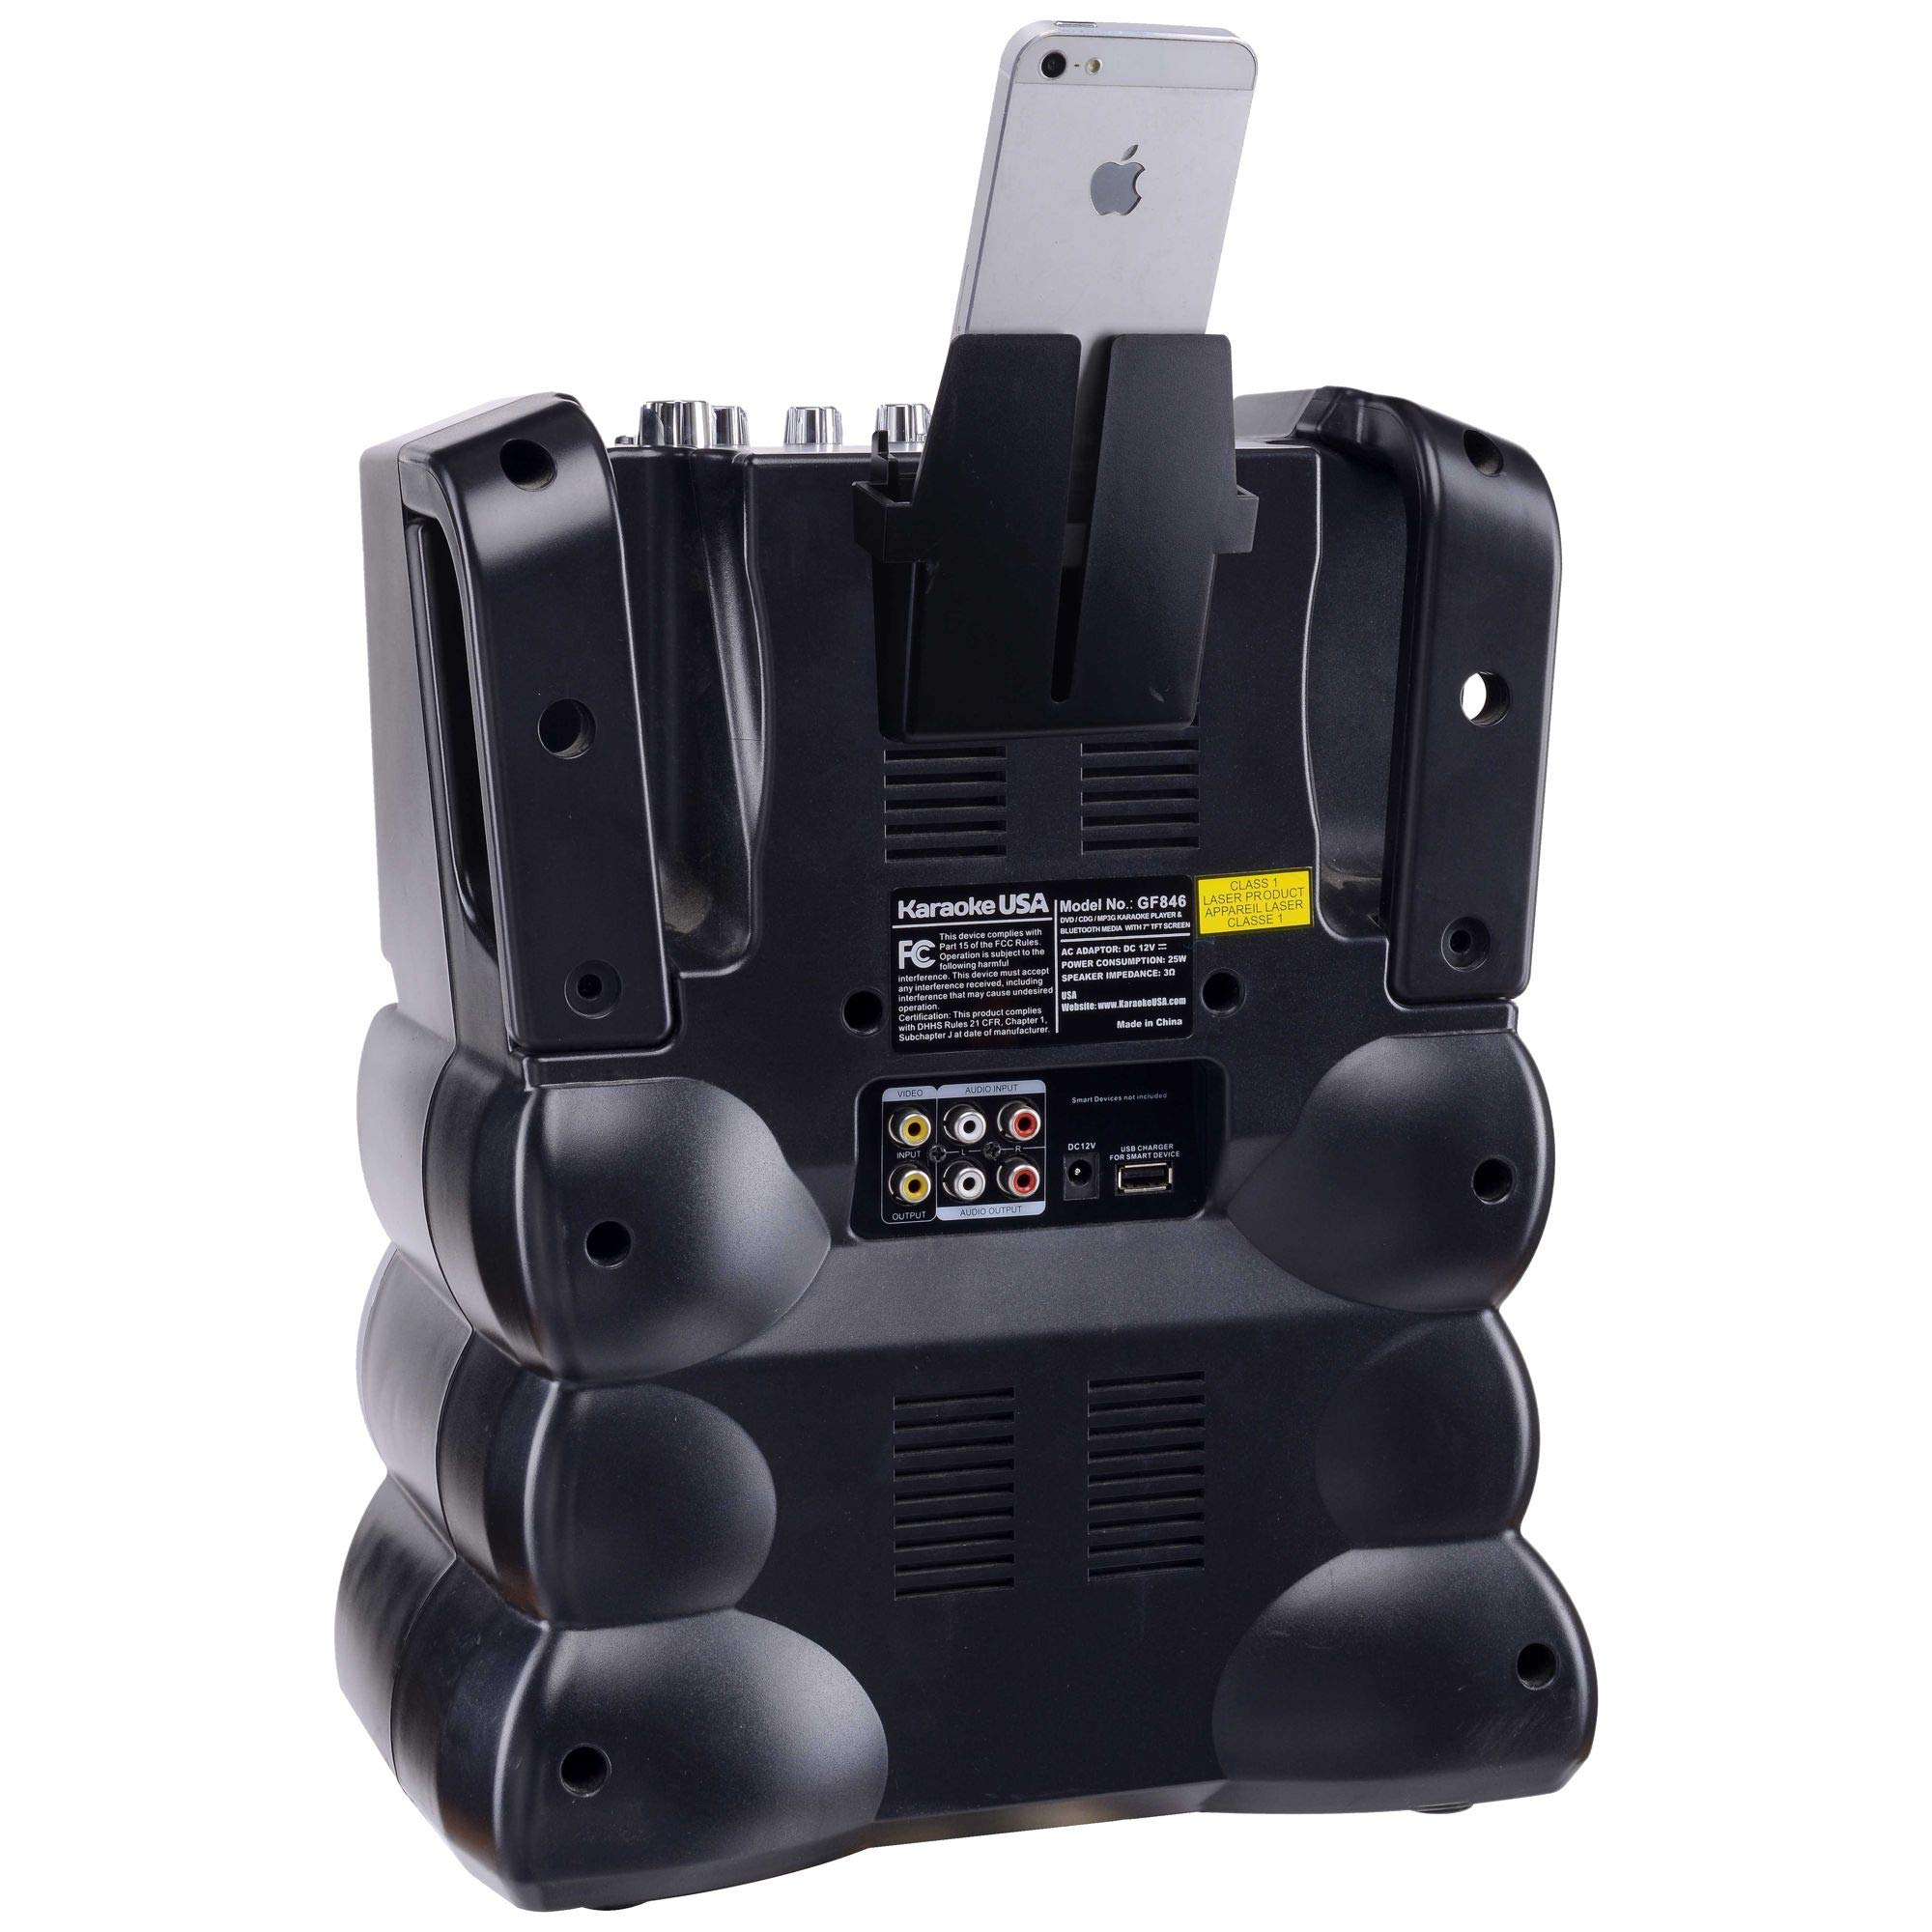 Karaoke USA GF846 DVD/CDG/MP3G Karaoke Machine with 7'' TFT Color Screen, Record, Bluetooth and LED Sync Lights by Karaoke USA (Image #8)